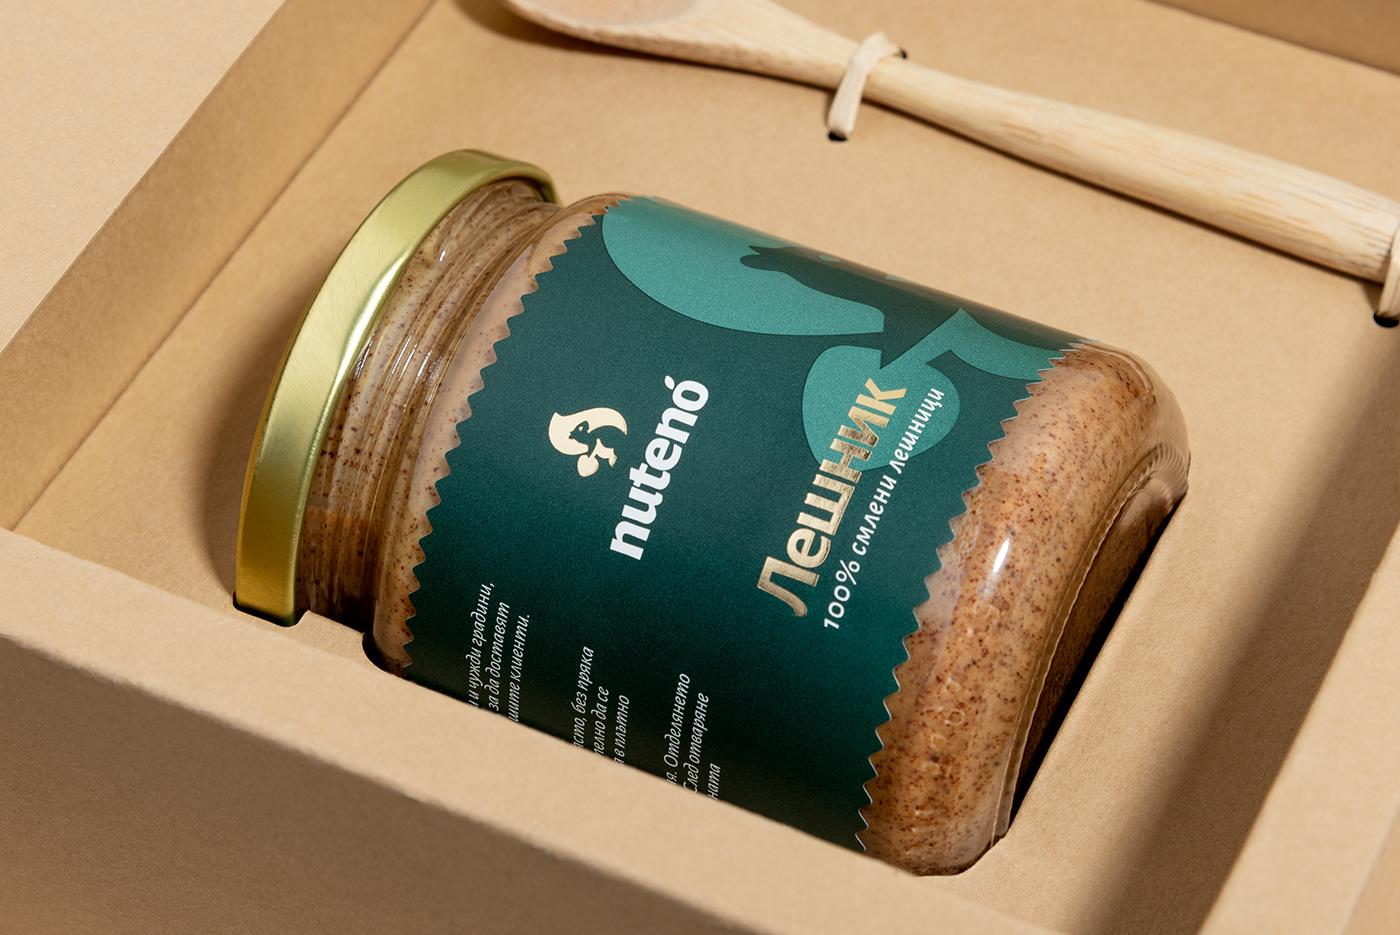 FoodProduct jar labels logo natural nuts Pack Packaging organic